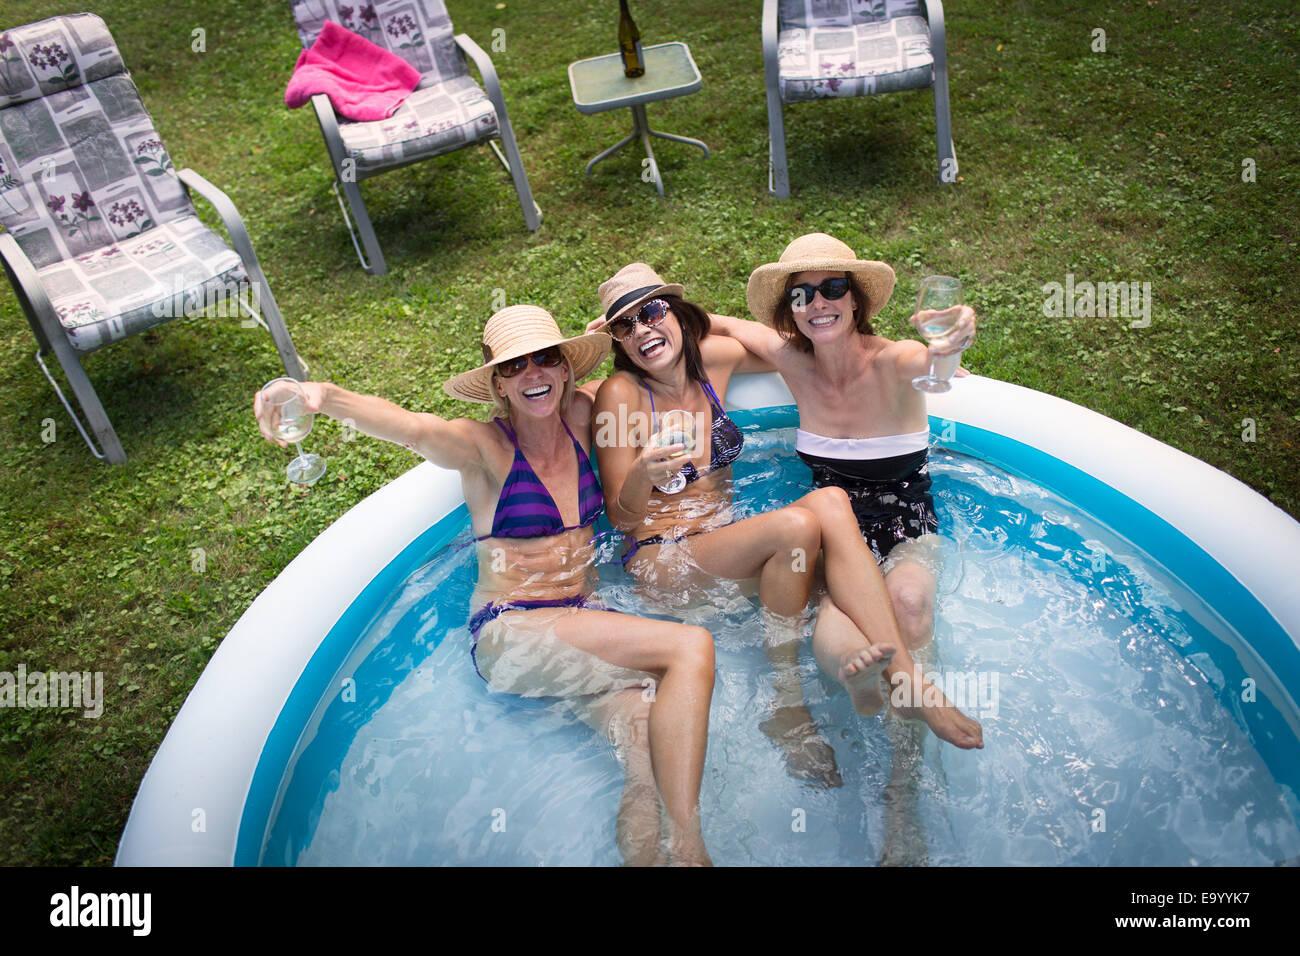 Three mature women sitting in paddling pool, drinking wine, elevated view Stock Photo